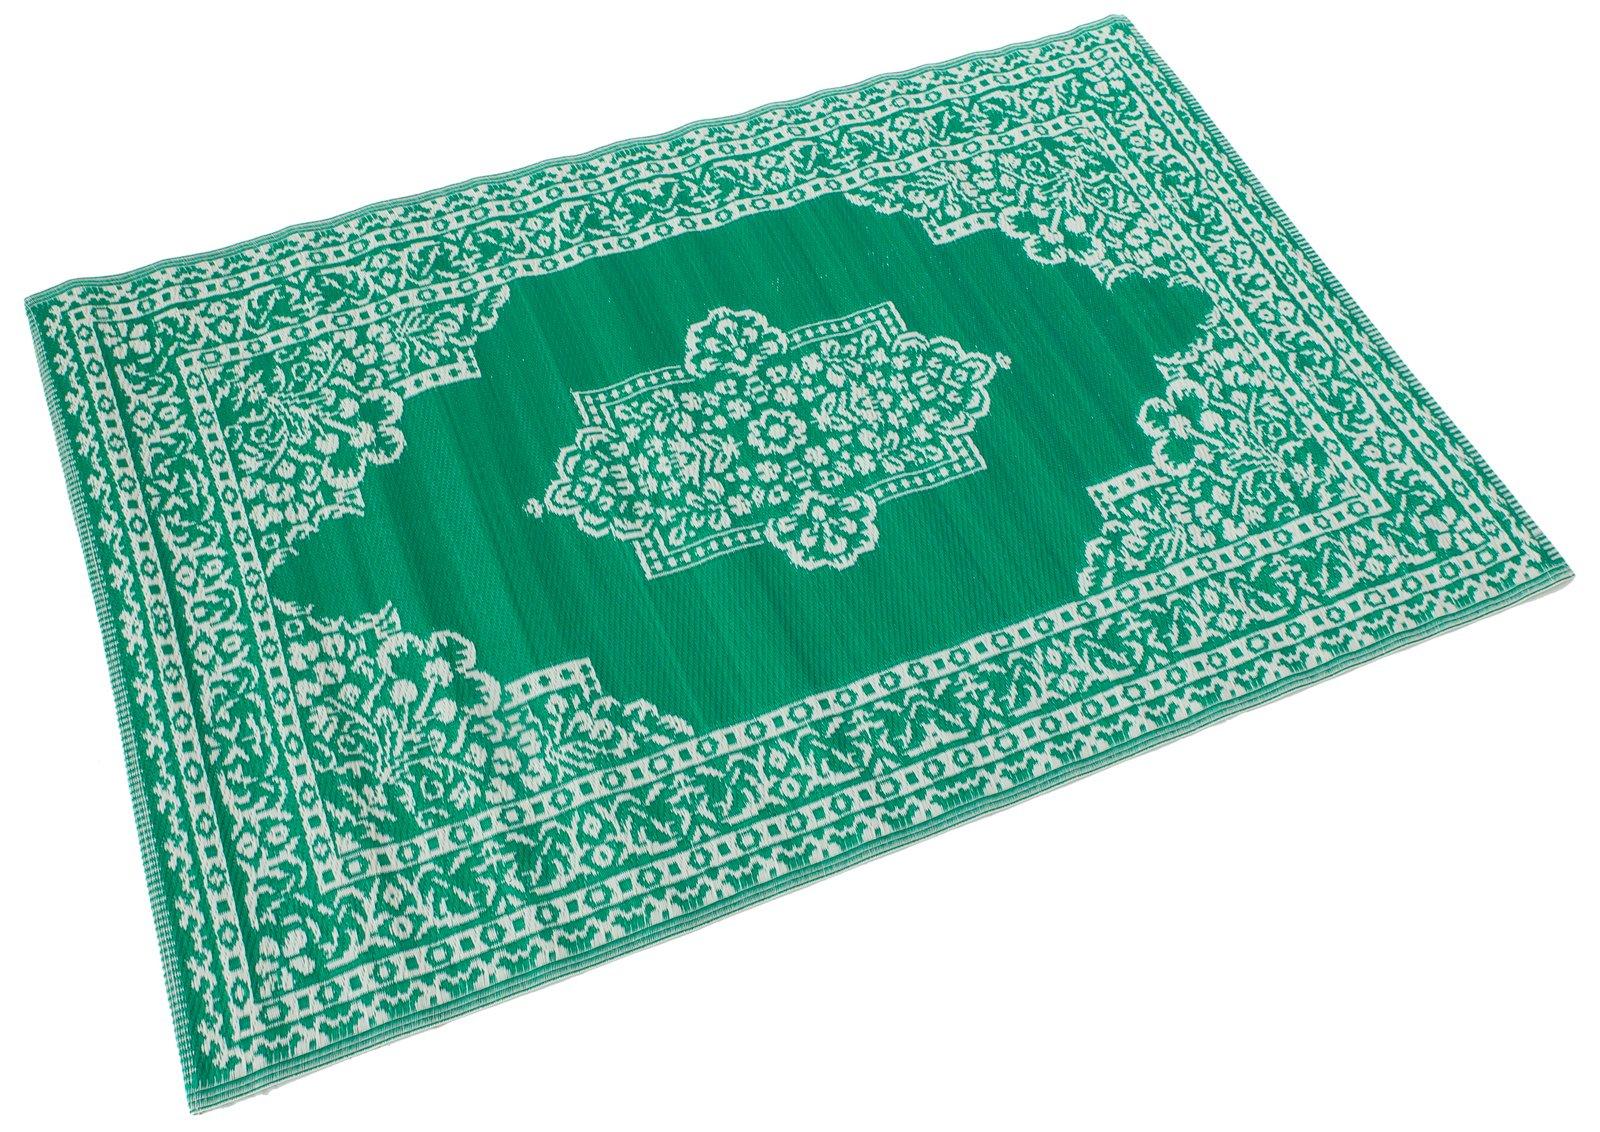 Tappeti Colorati Per Camerette : Tappeti moderni colorati o decorativi da a euro cose di